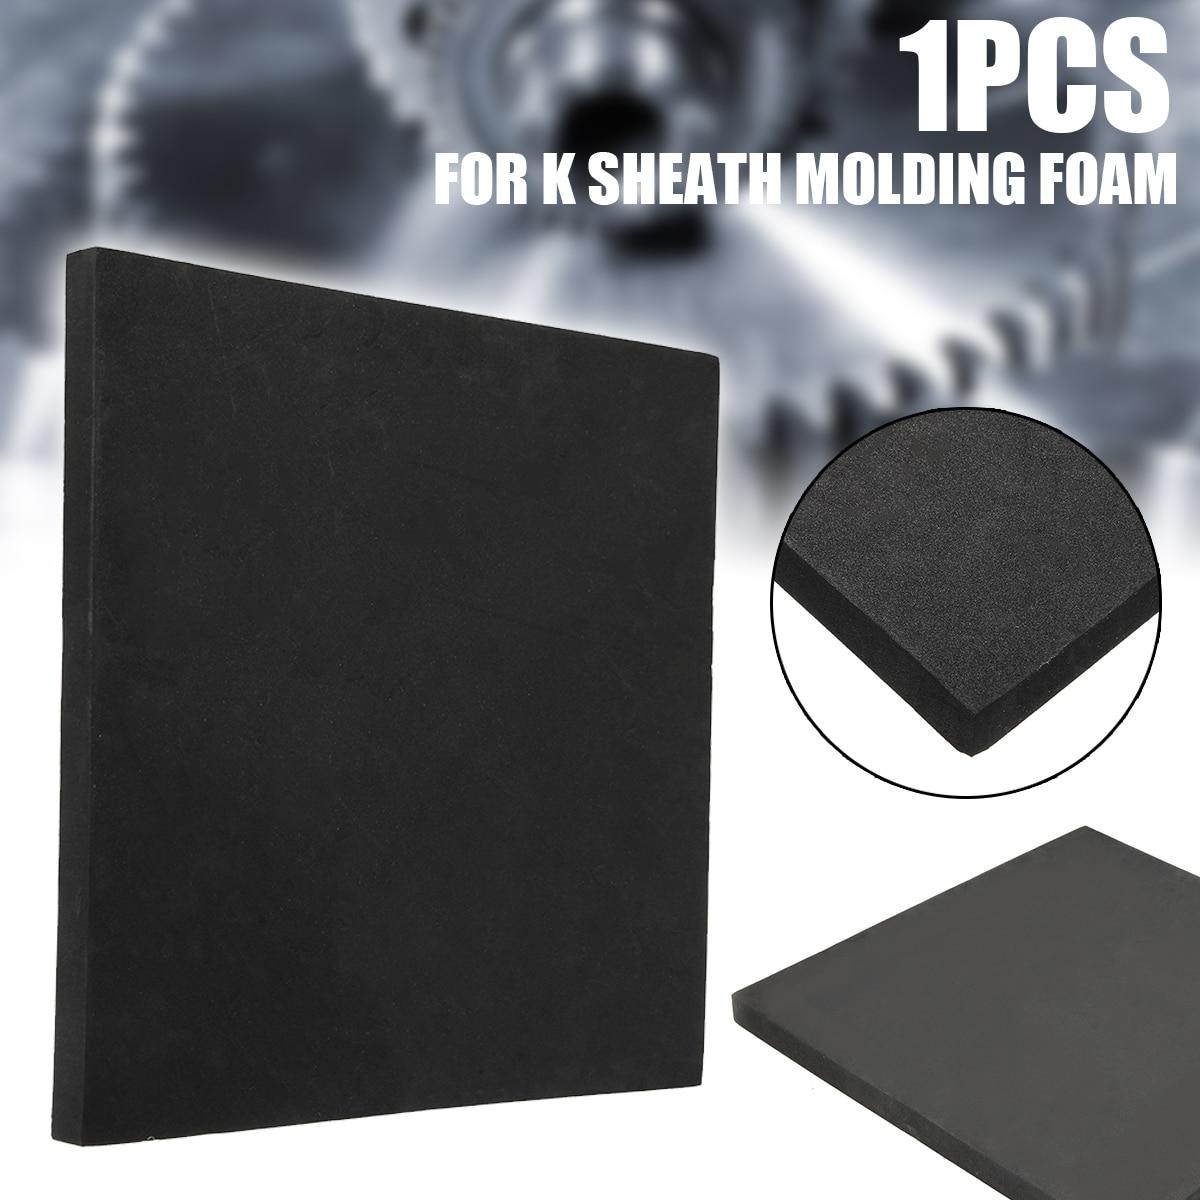 1pc 320*320*20mm EVA Adhesive Foam For Knife K Sheath Molding EVA Sponges For Kydex Extrusion Sheath Produce Protector